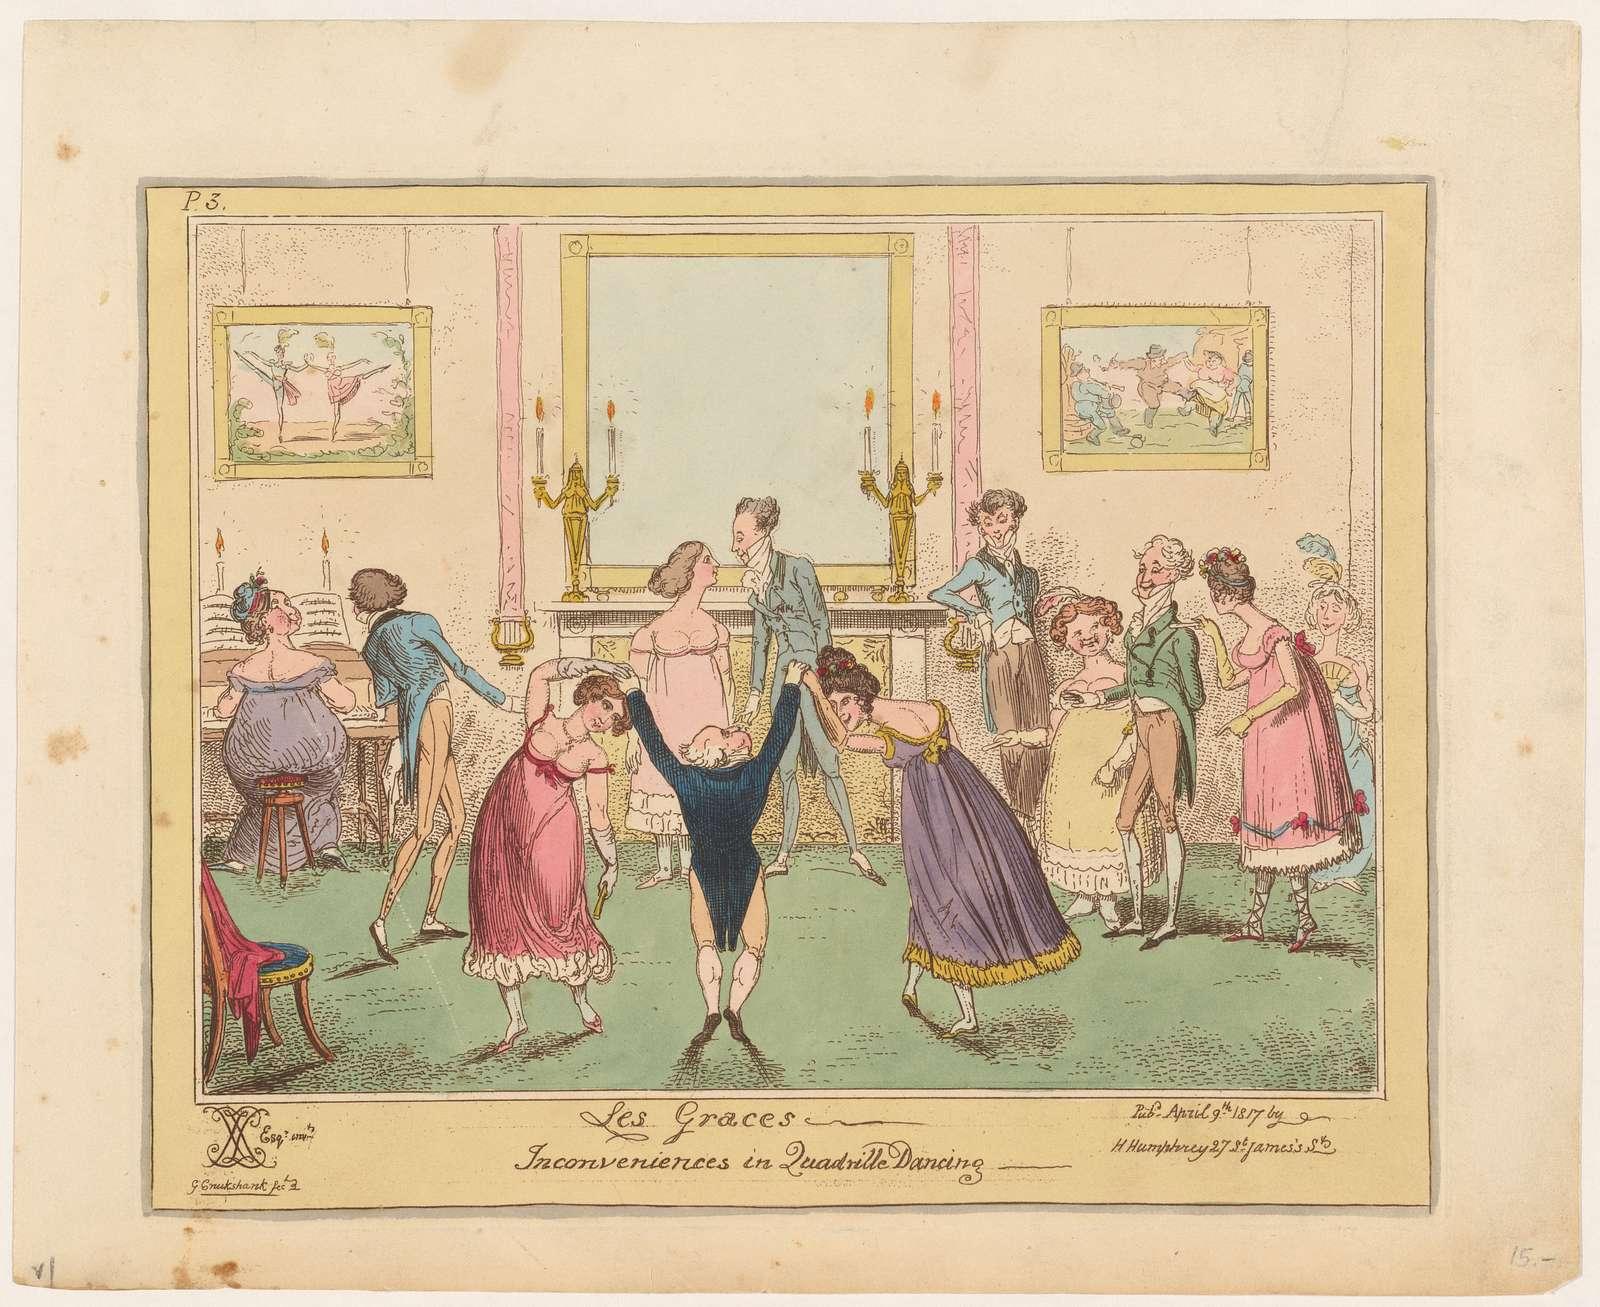 Graces: Inconveniences in quadrille dancing